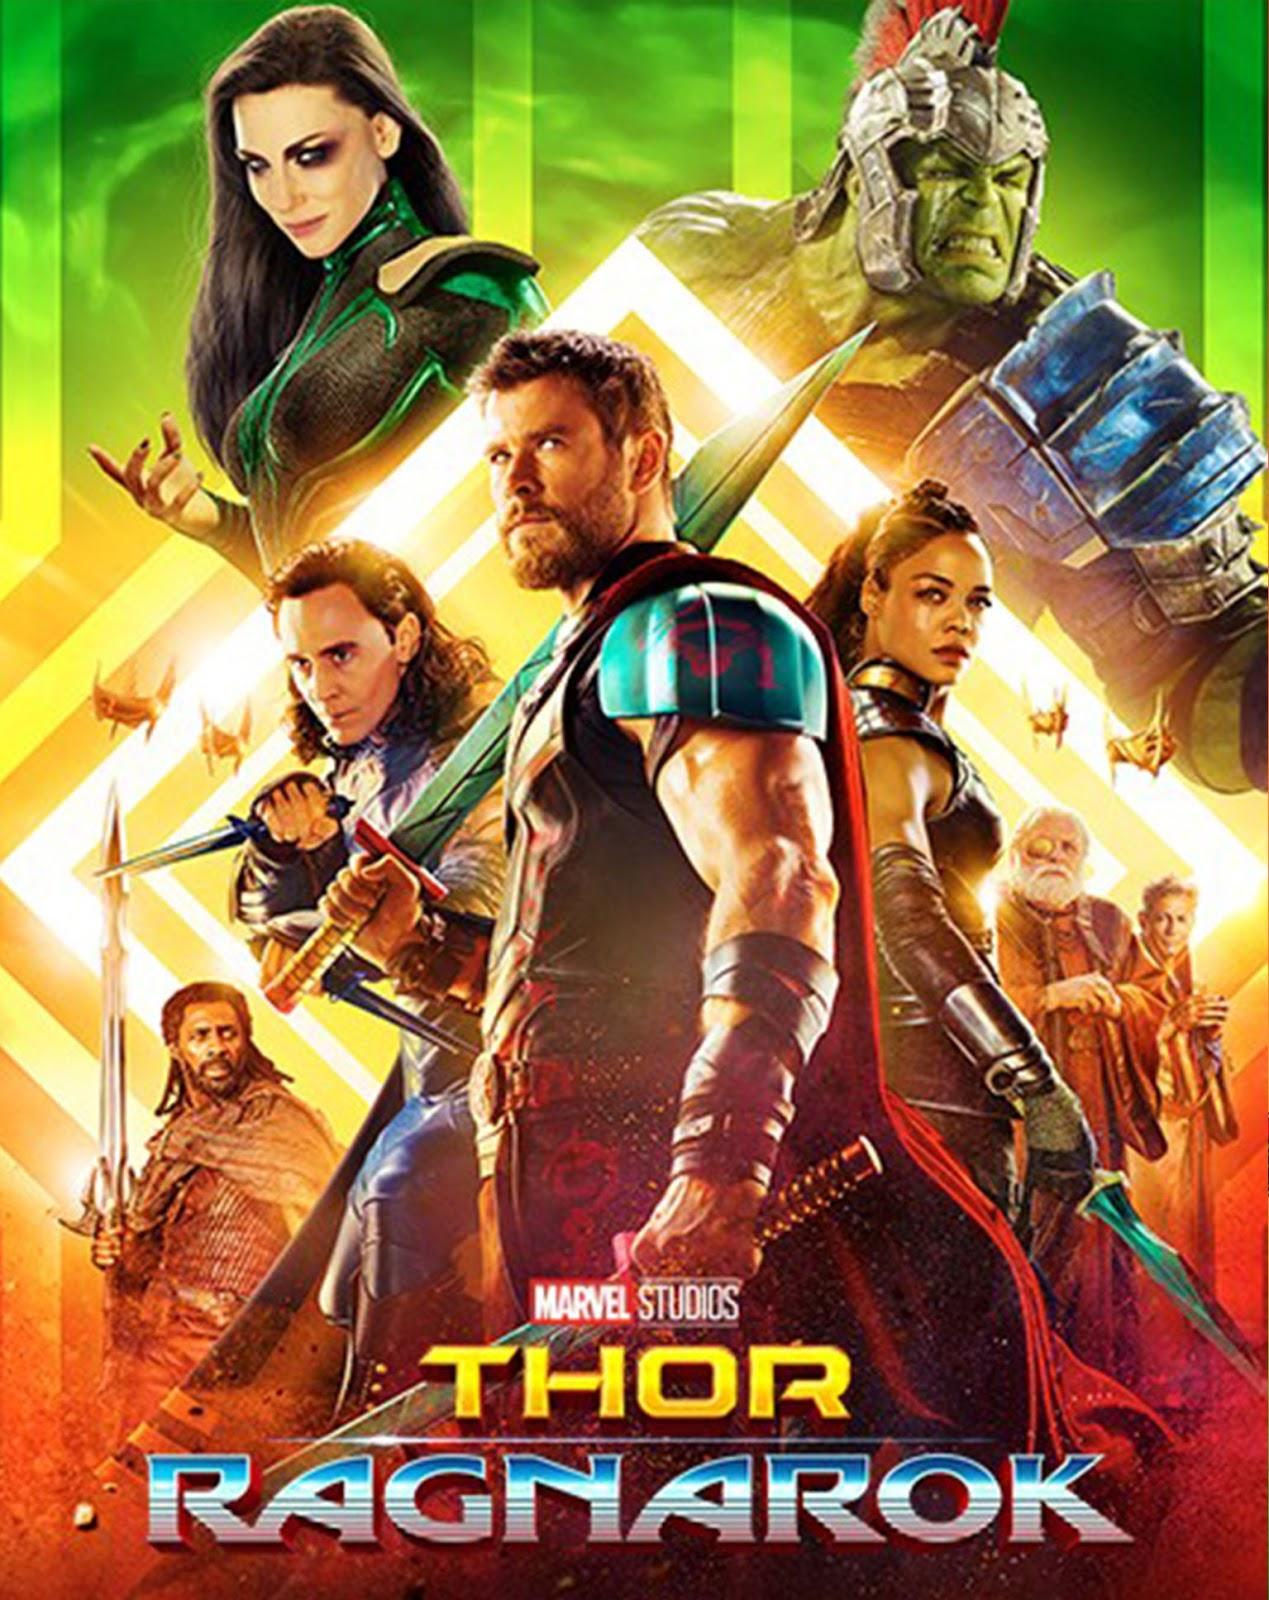 Thor: Ragnarok [2017] [DVDR] [NTSC] [Latino]